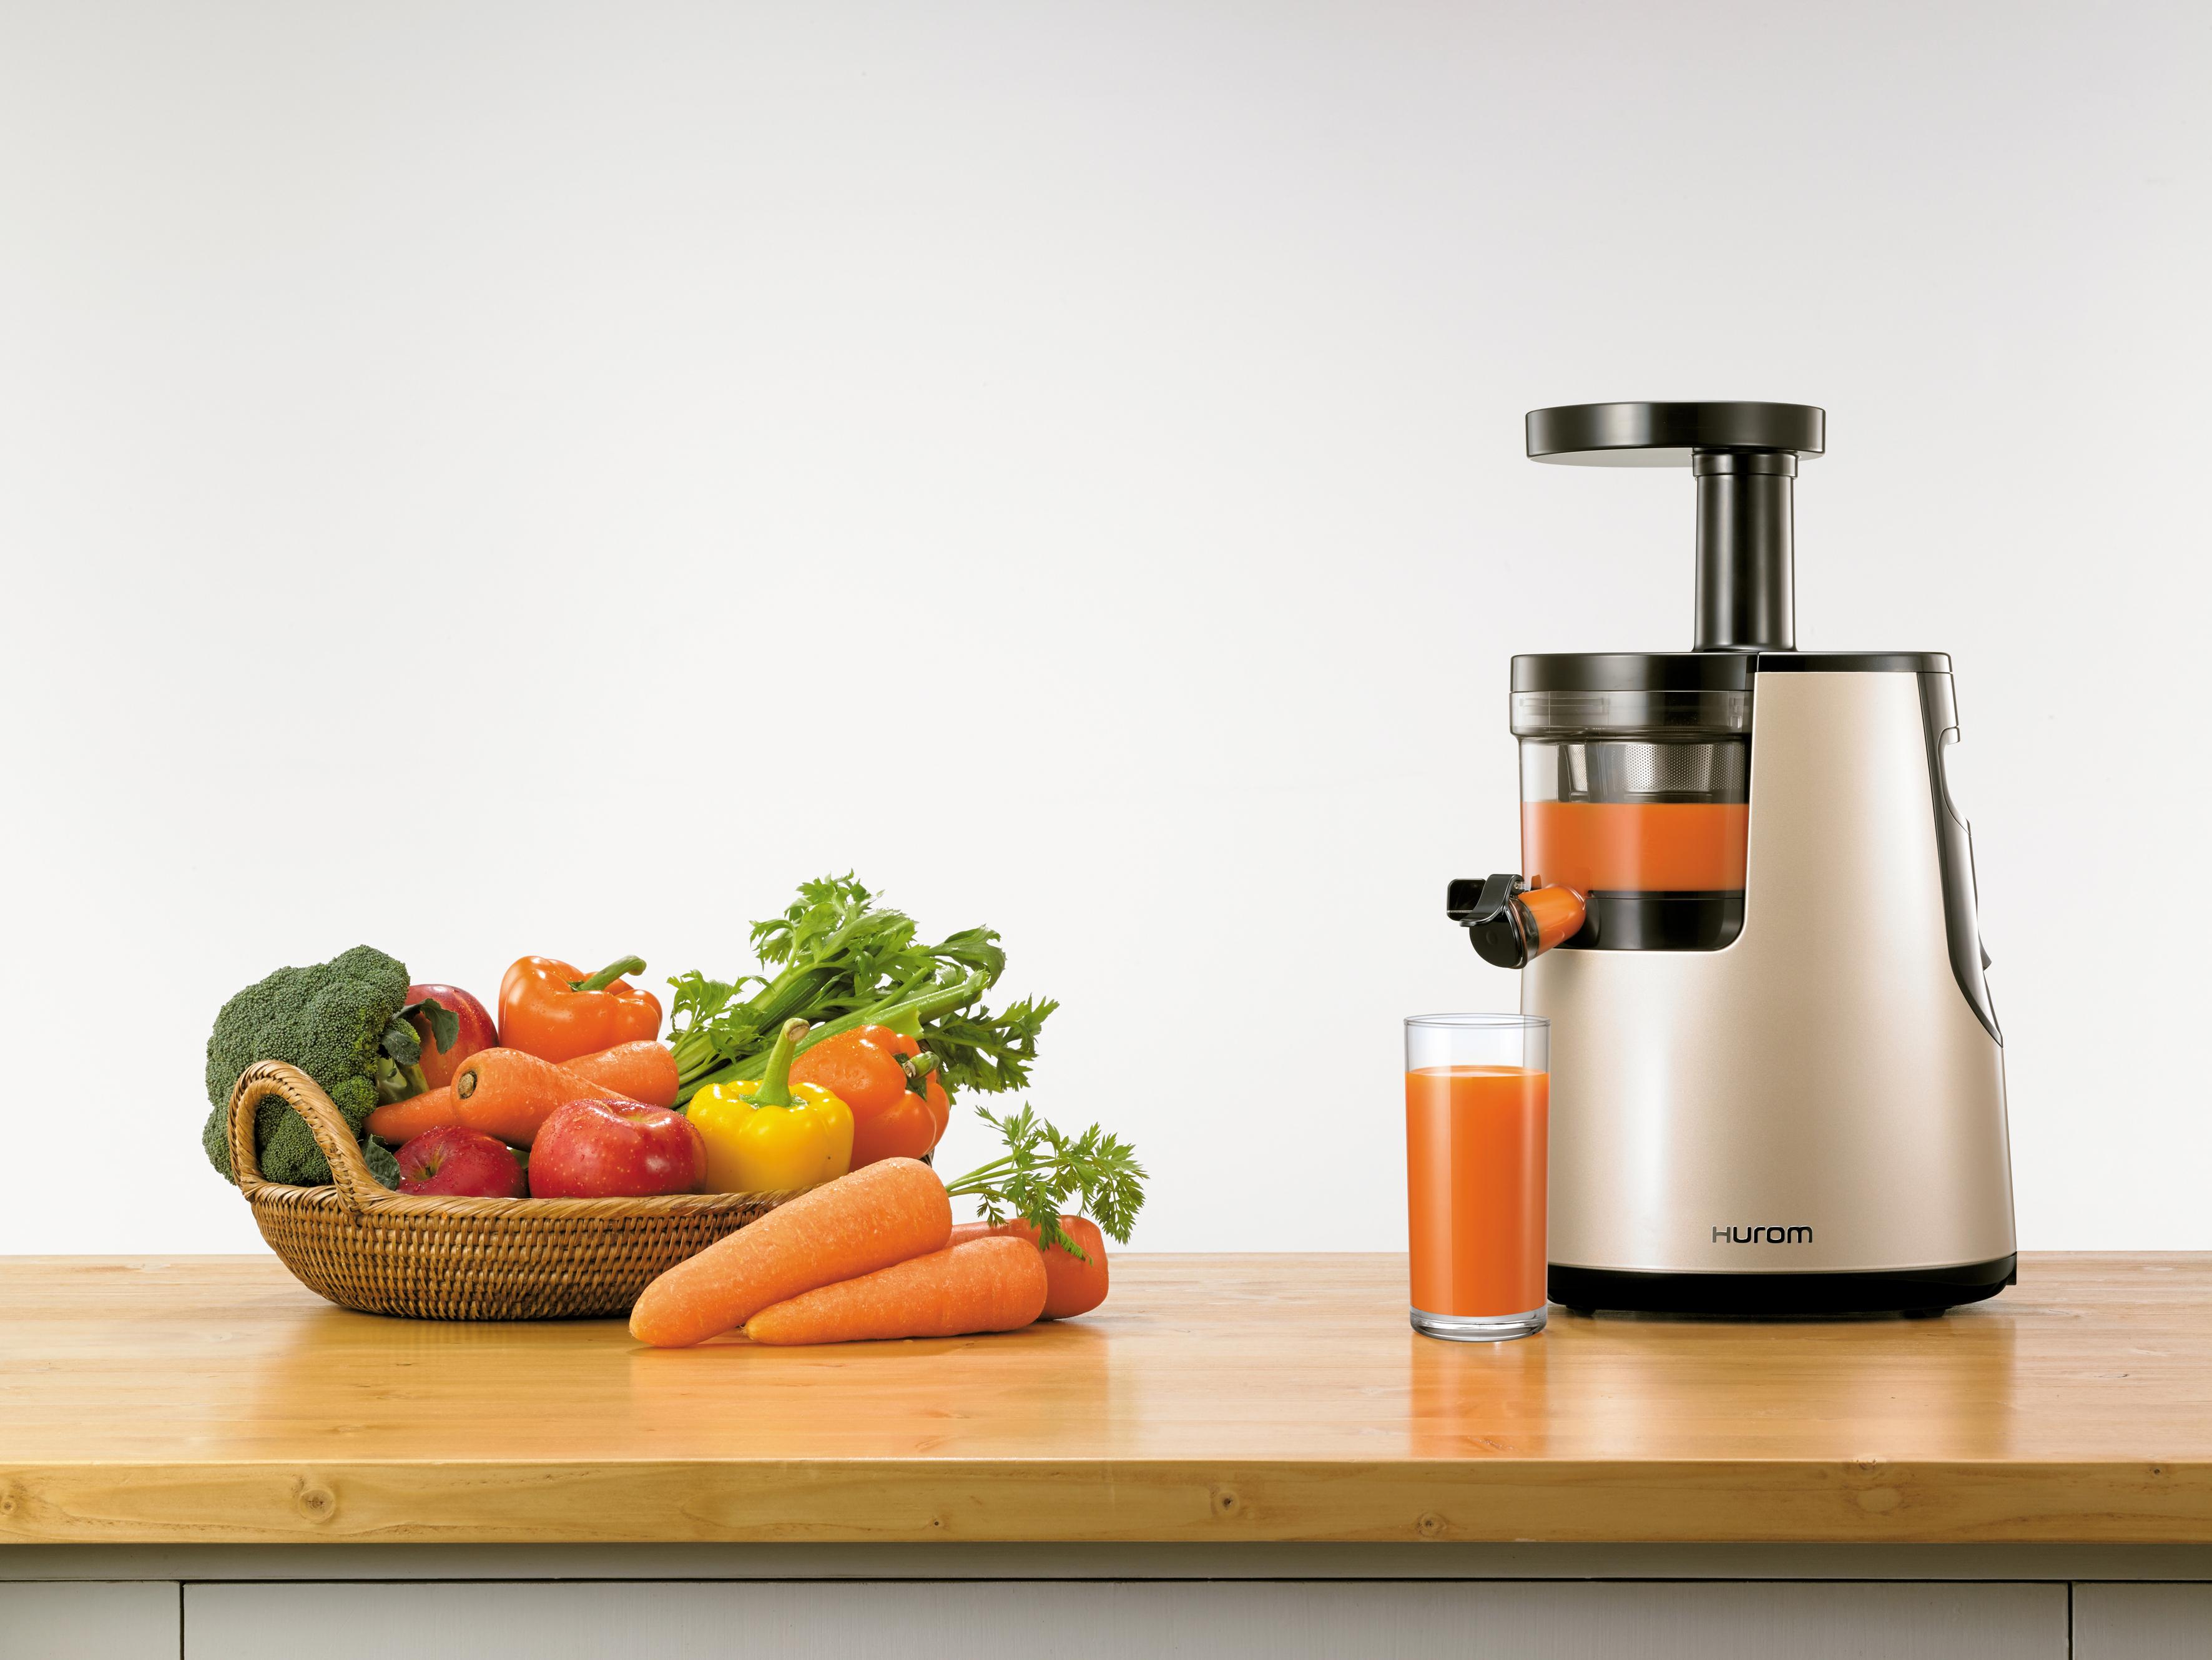 HUROM_薯2_Carrot_a.jpg